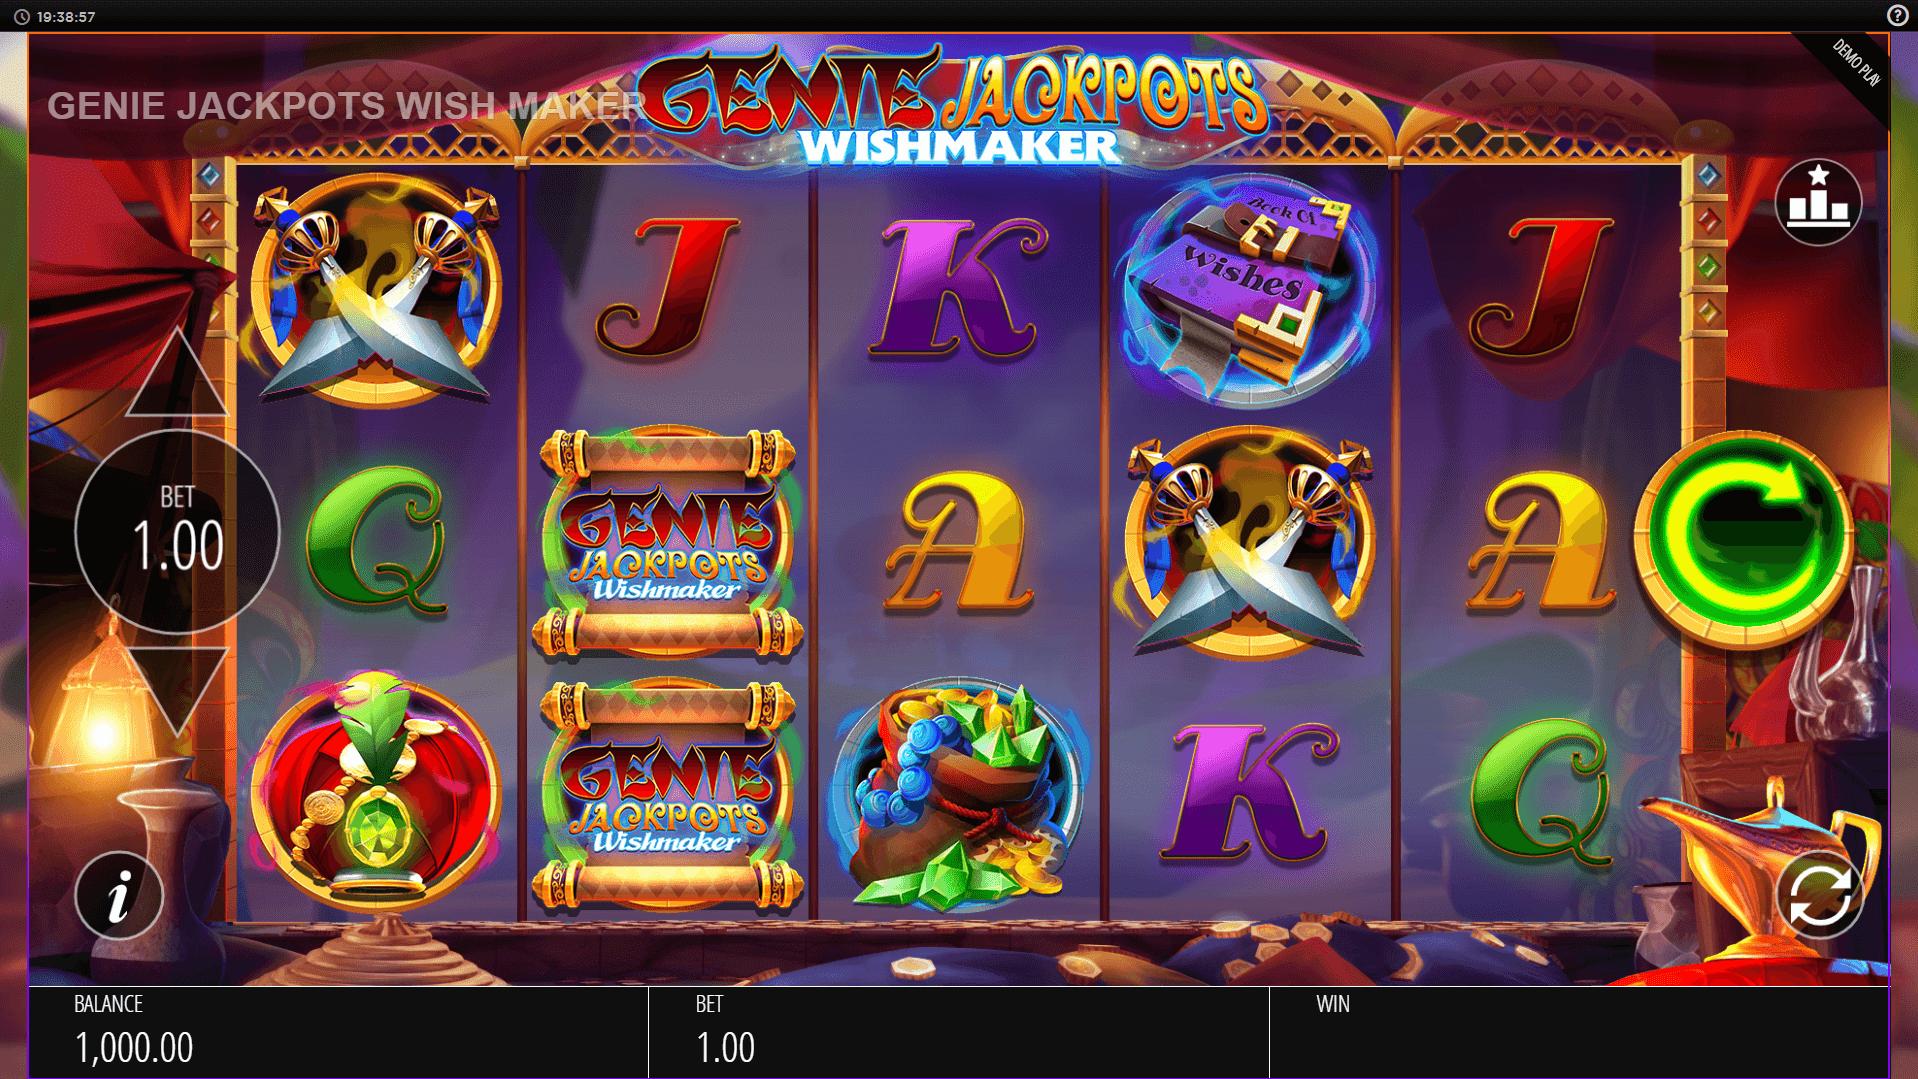 Genie Jackpots Wishmaker slot machine screenshot